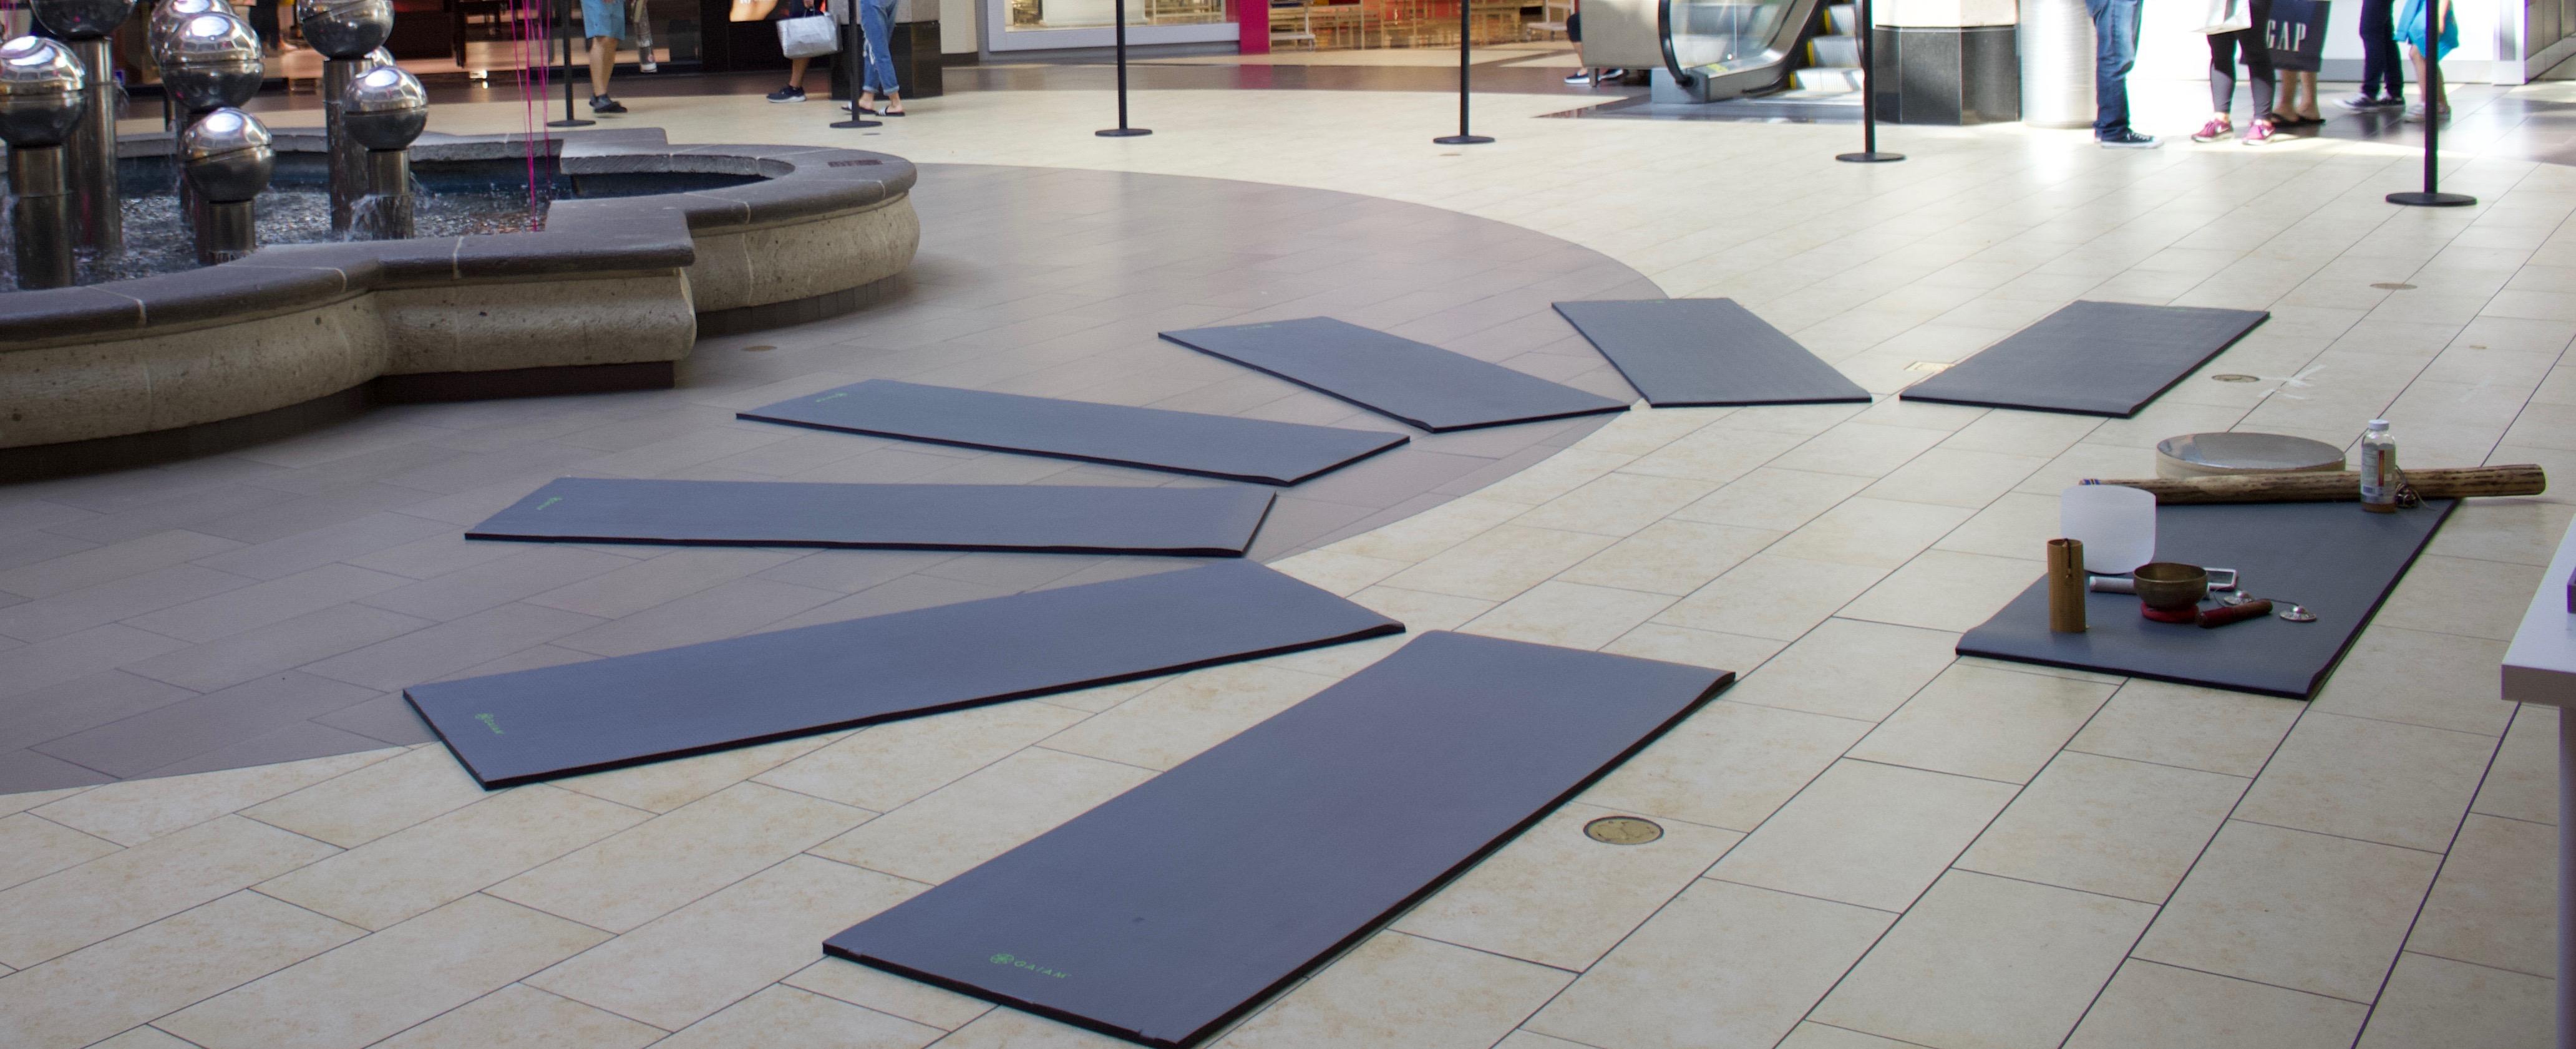 lululemon brea mall classes